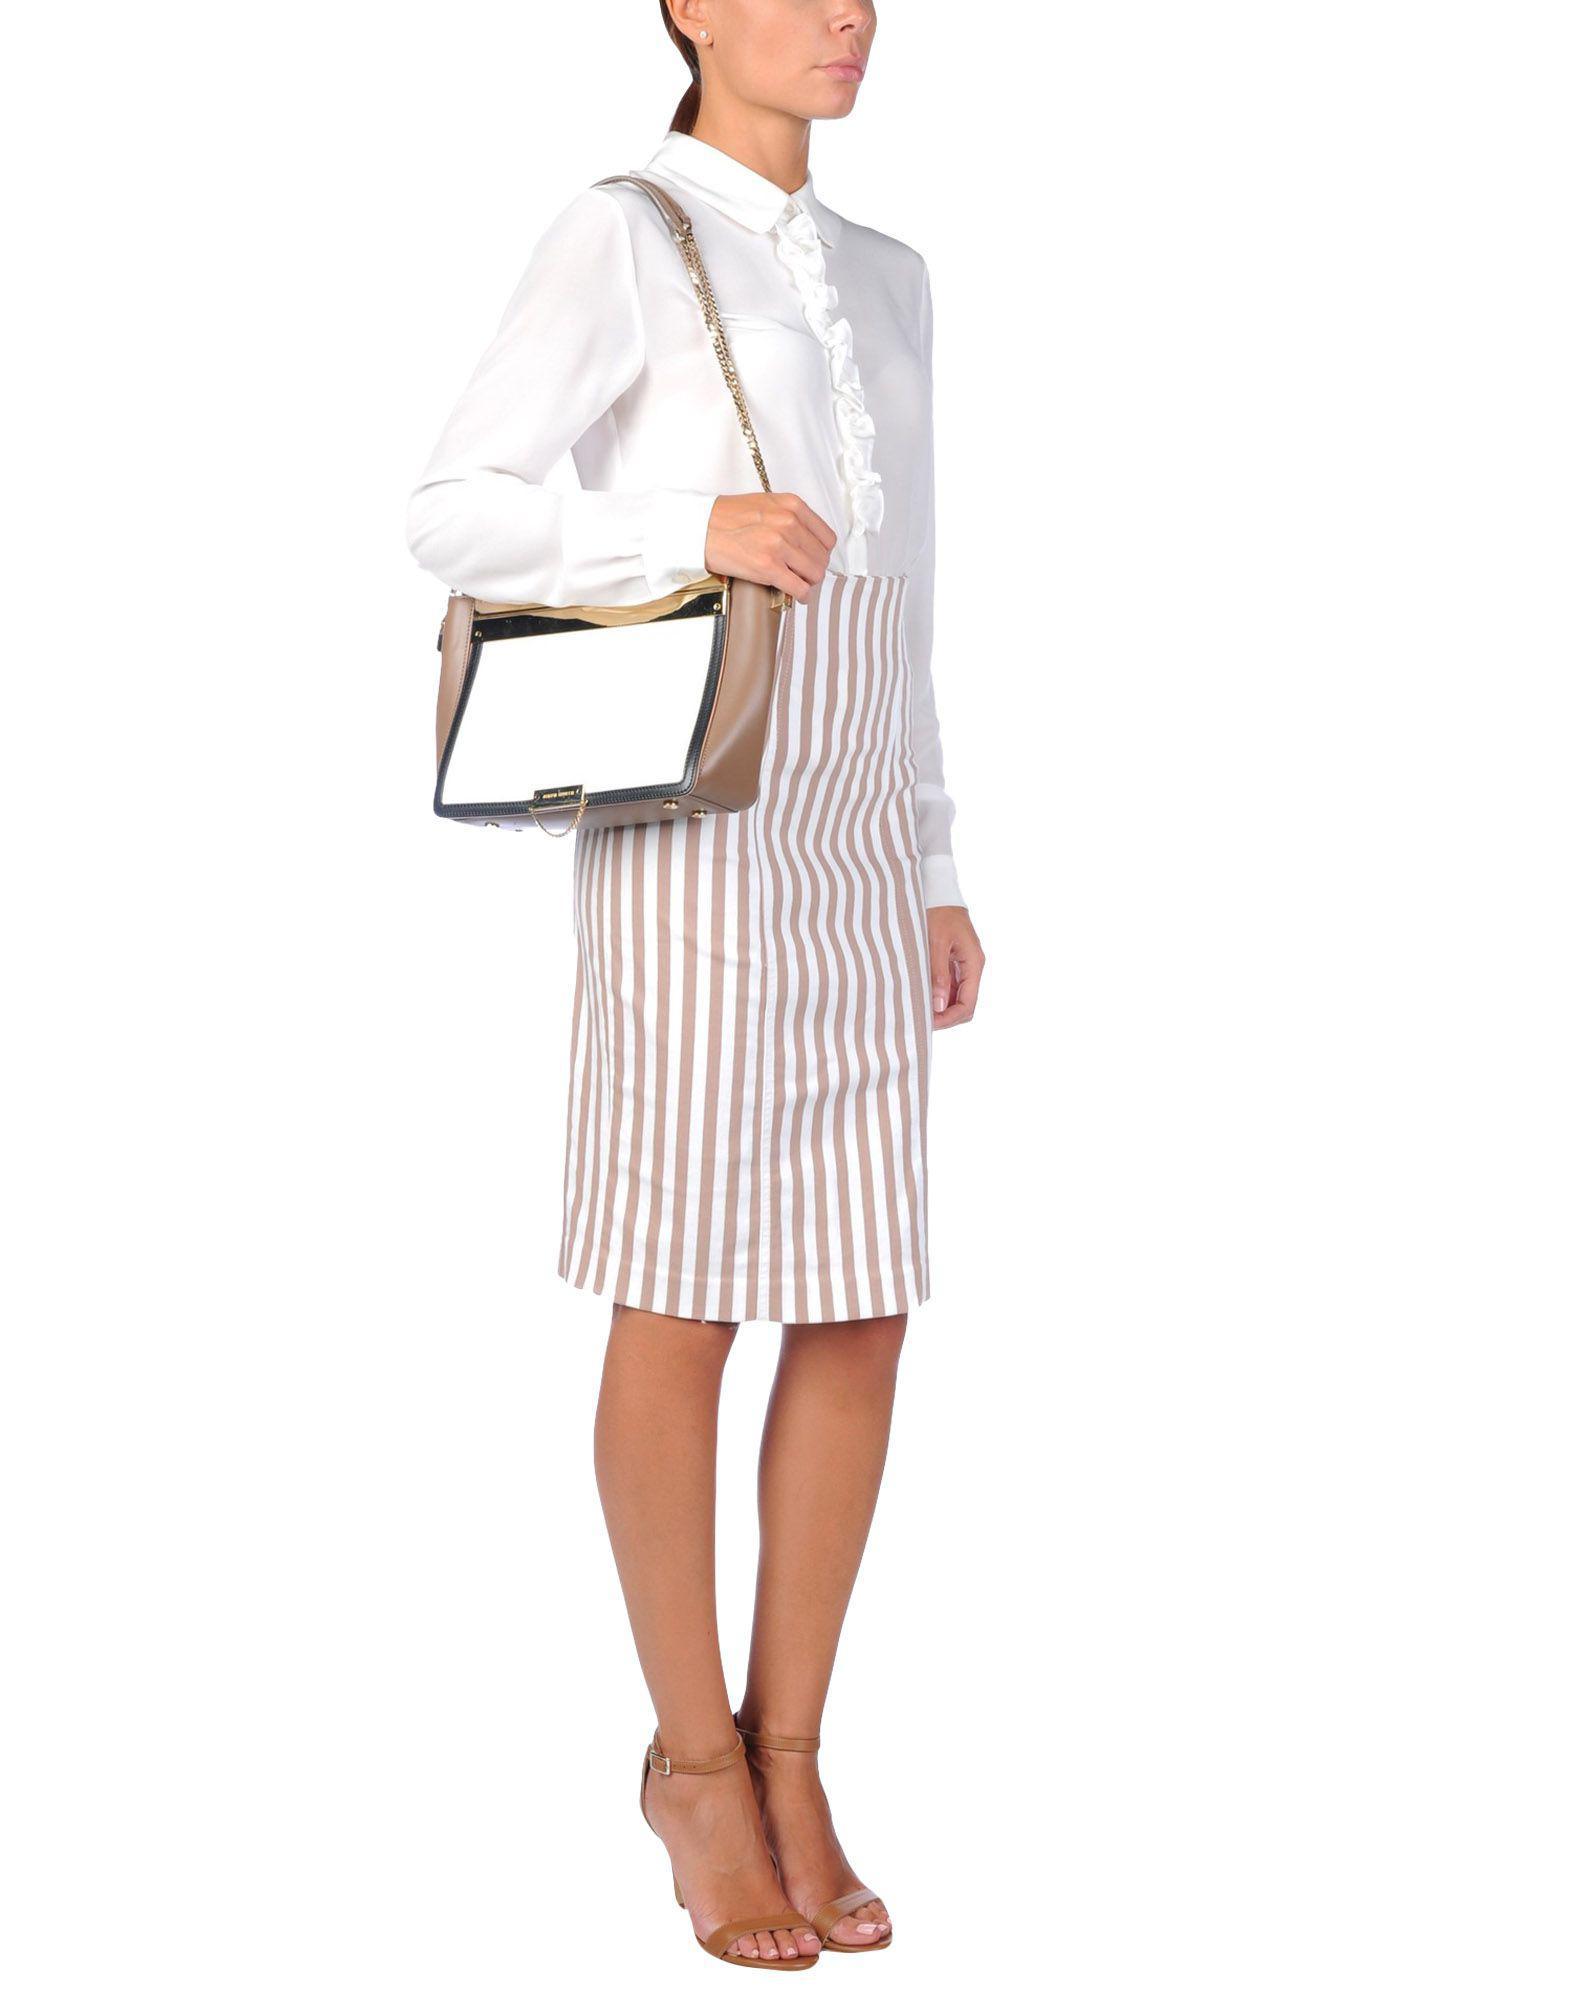 Alberta Ferretti Leather Cross-body Bag in Ivory (White)